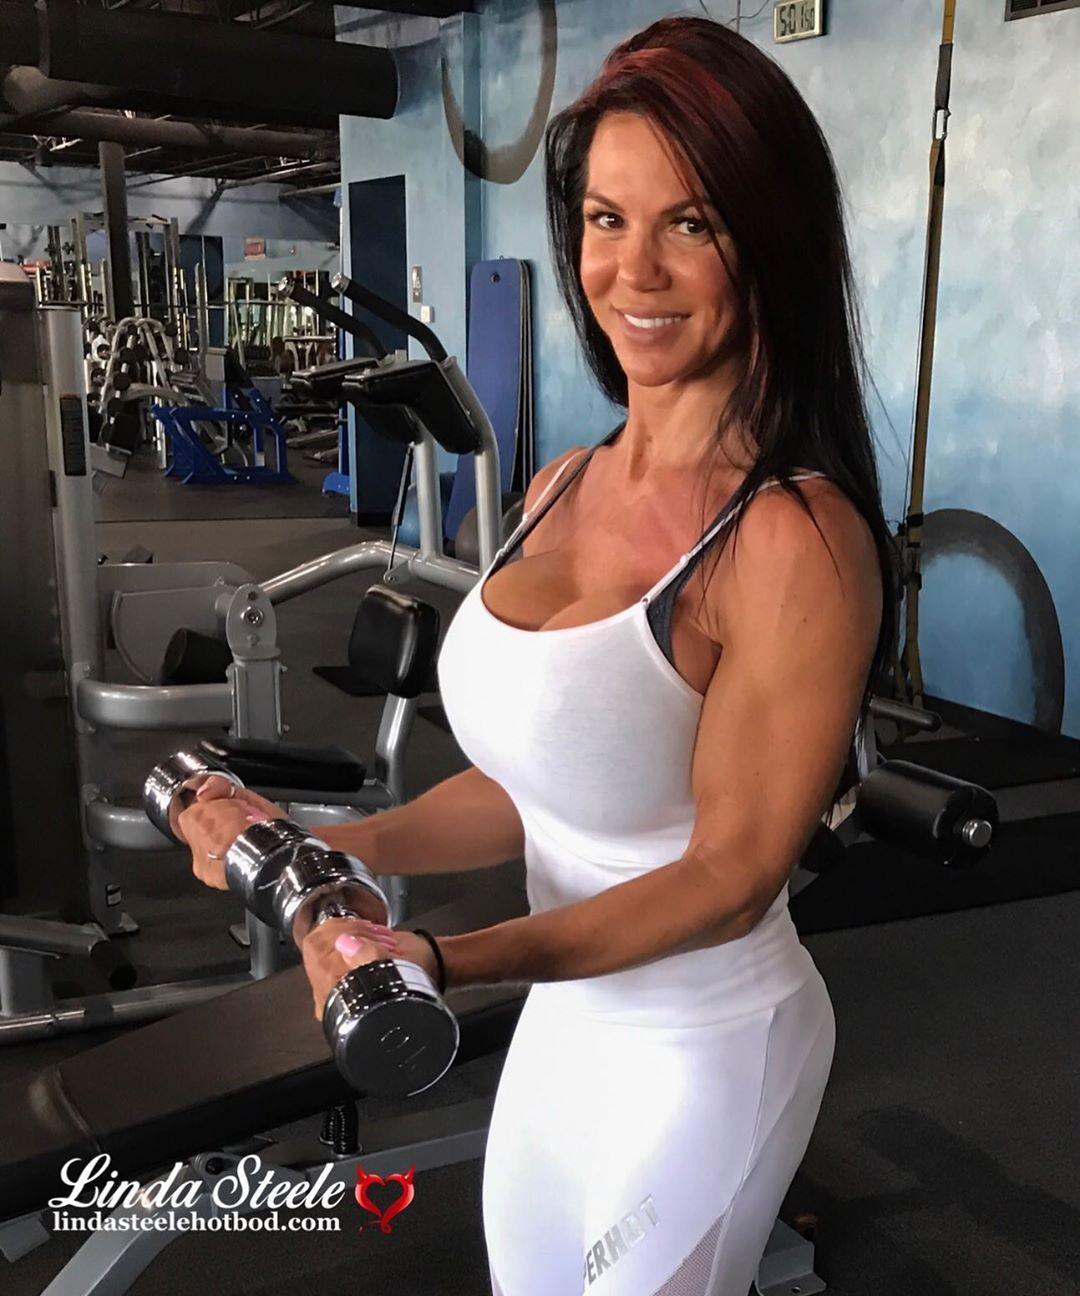 Linda Steele Pep Fitness Models Bikini Models Steele